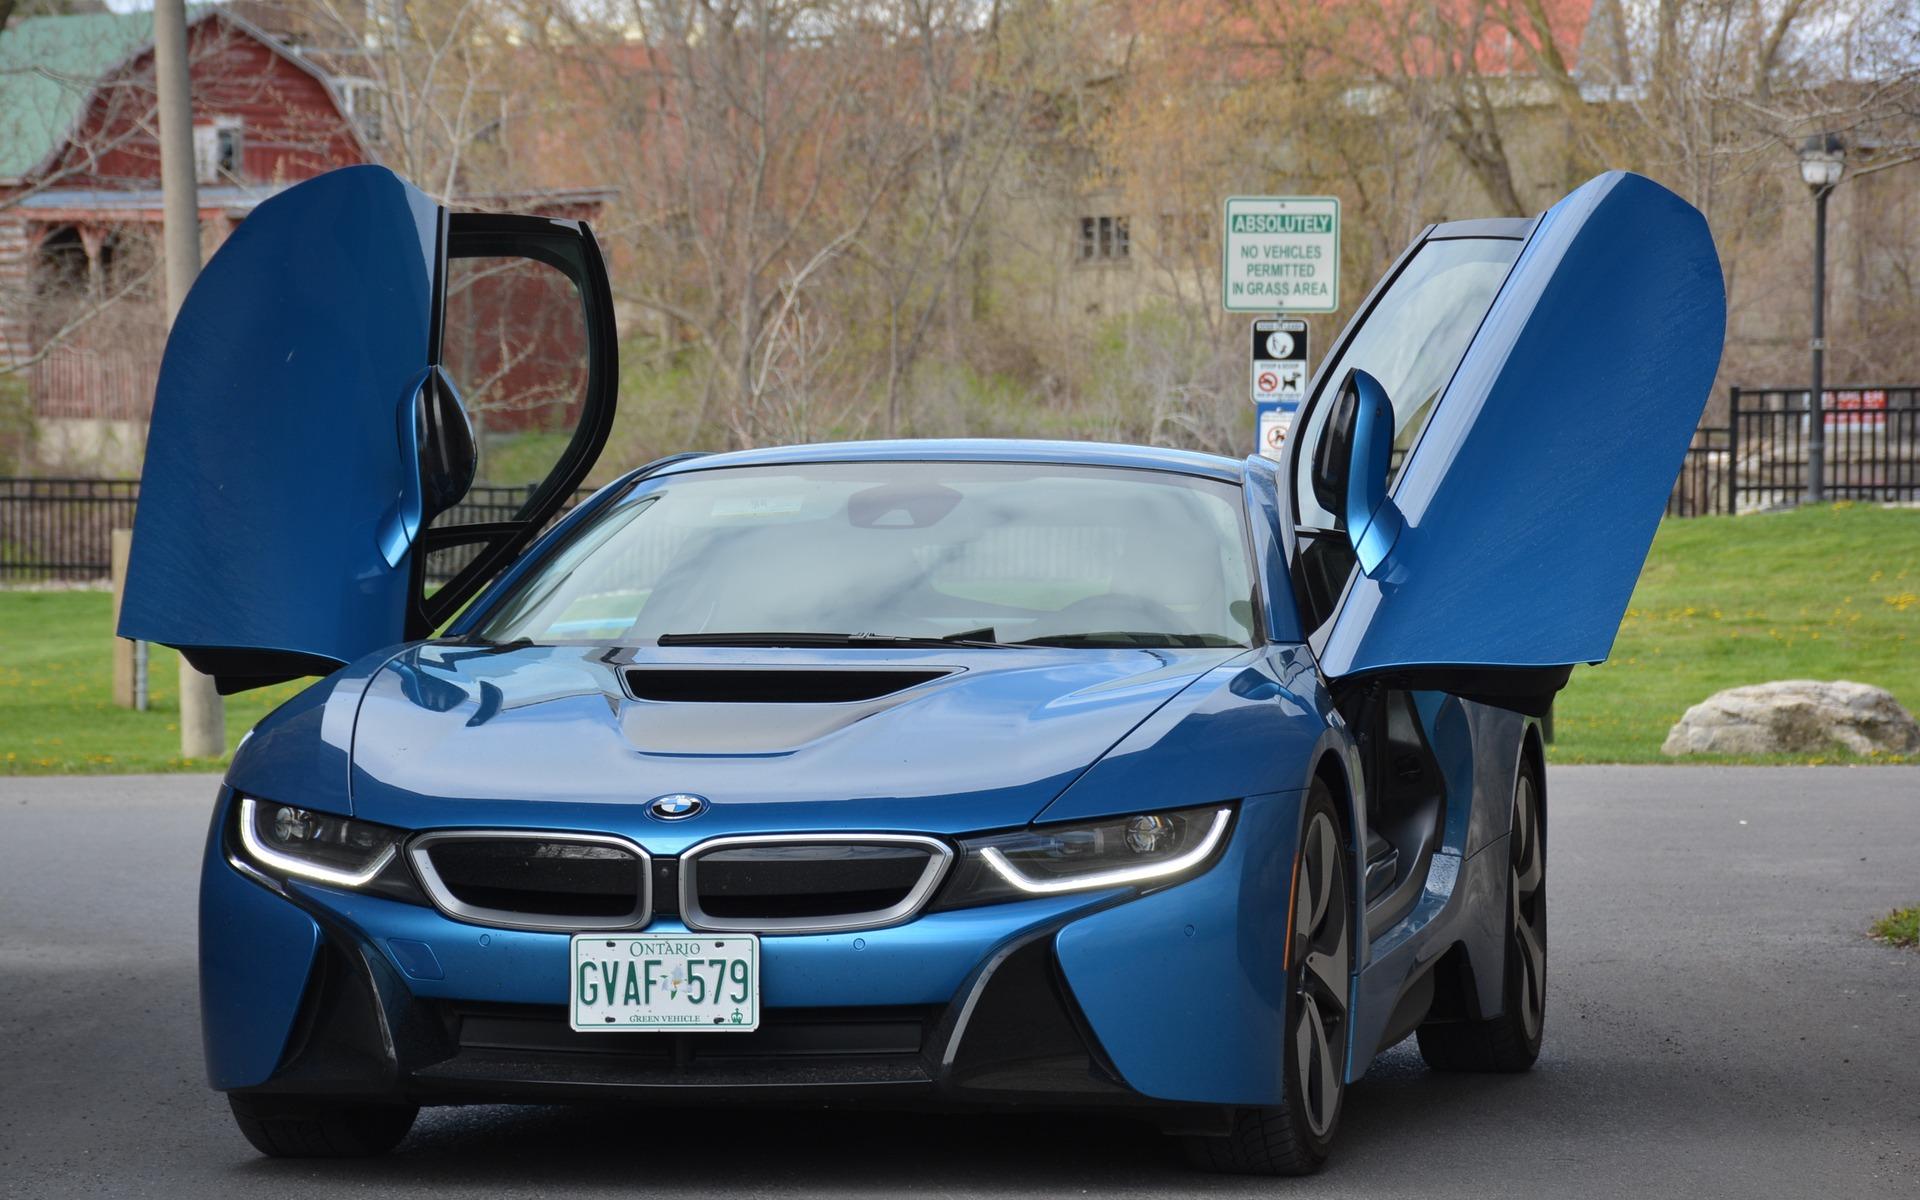 The BMW i8 from Toronto to Ottawa